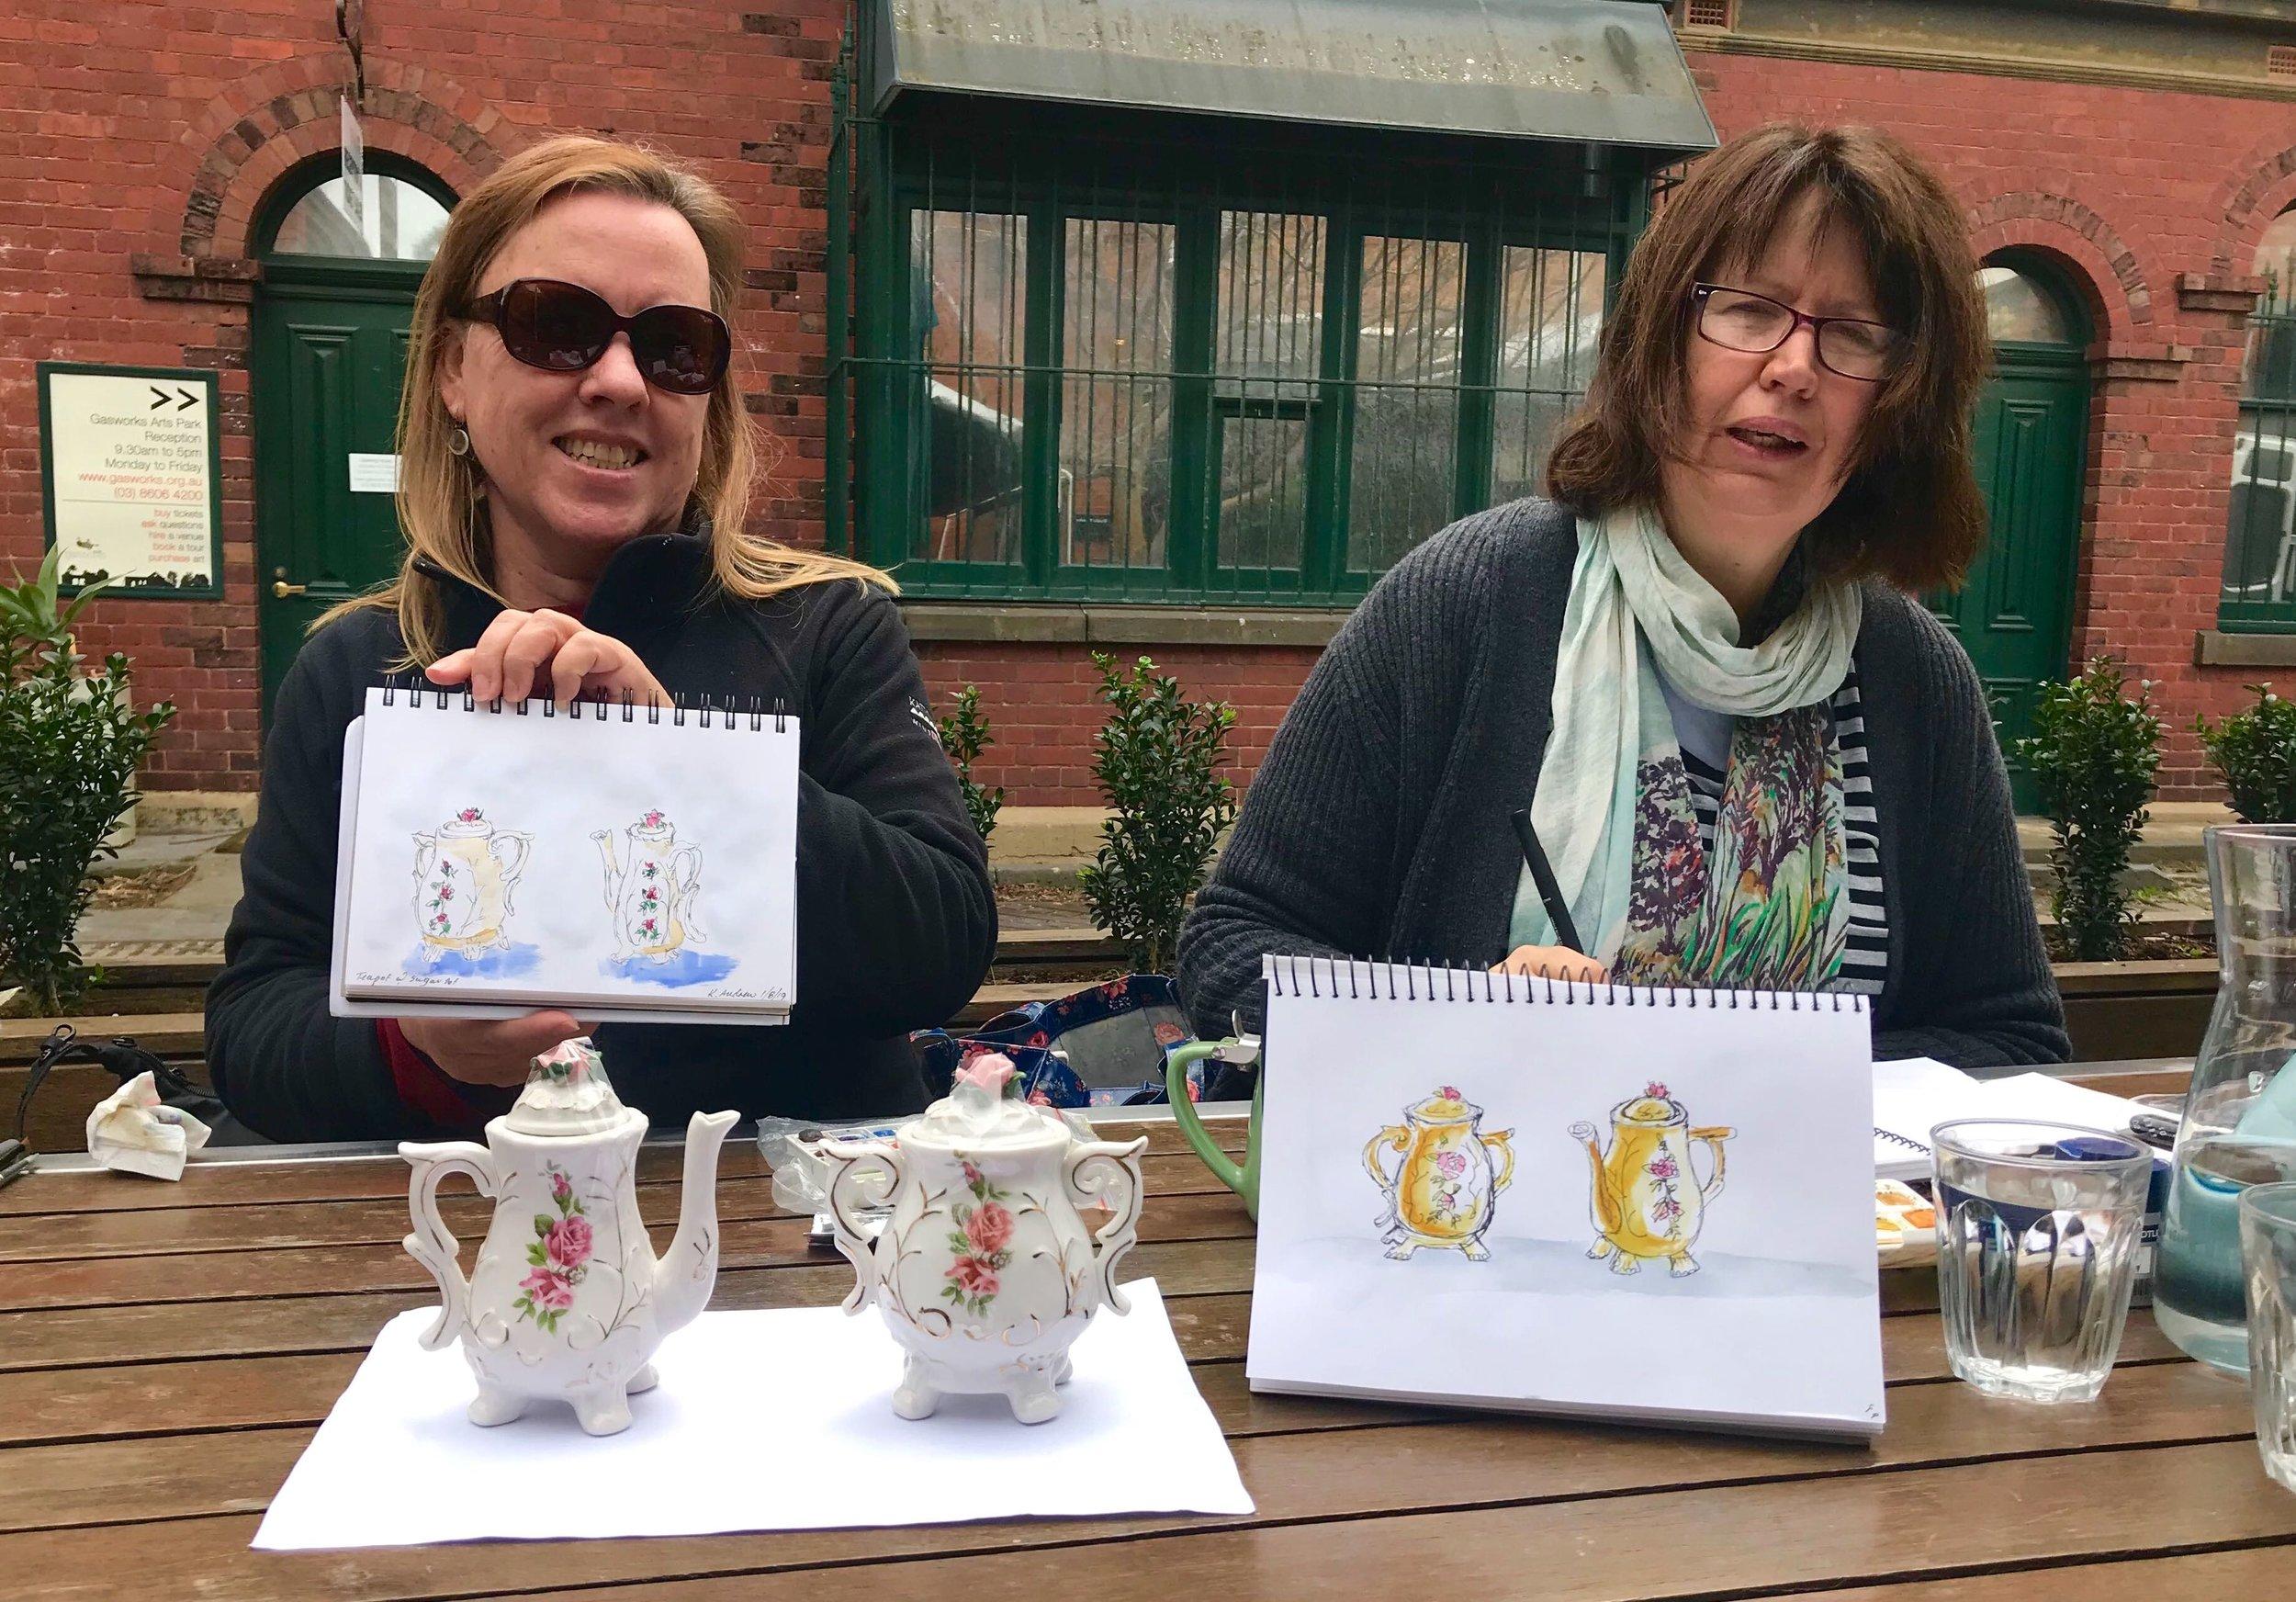 Erin Hill Sketching Melbourne 7.jpg